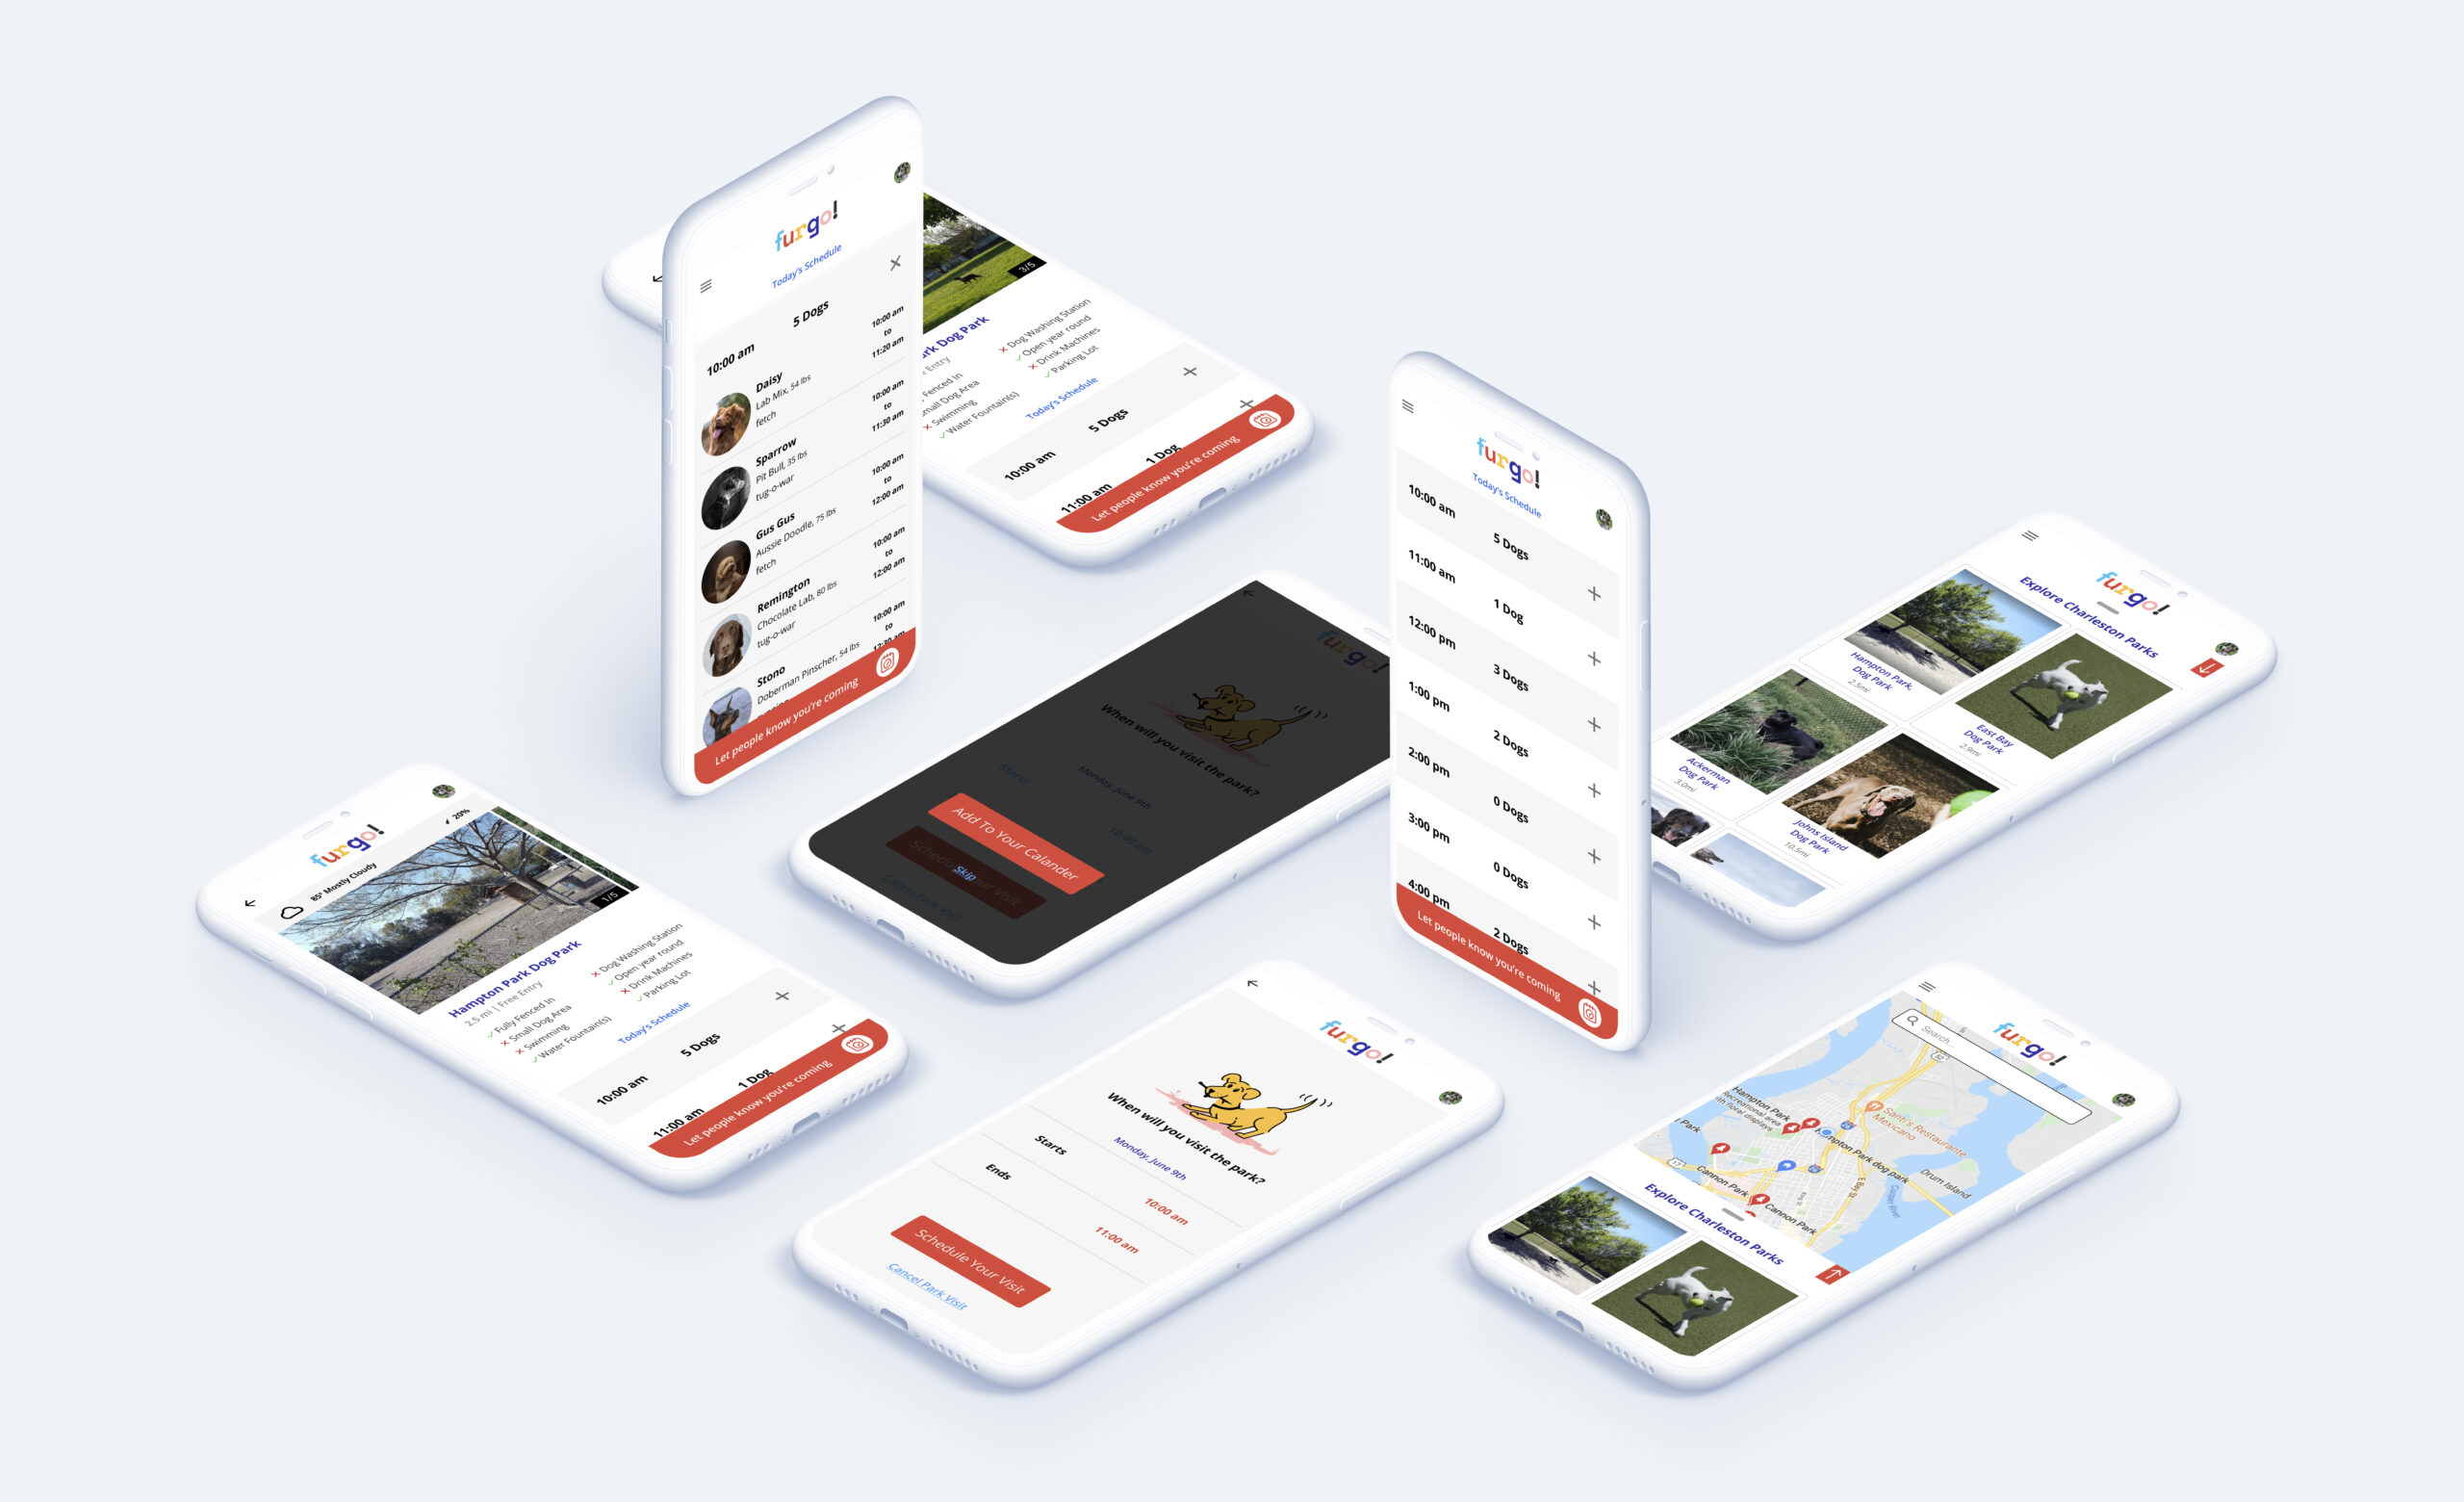 Furgo iphone 11 mockups